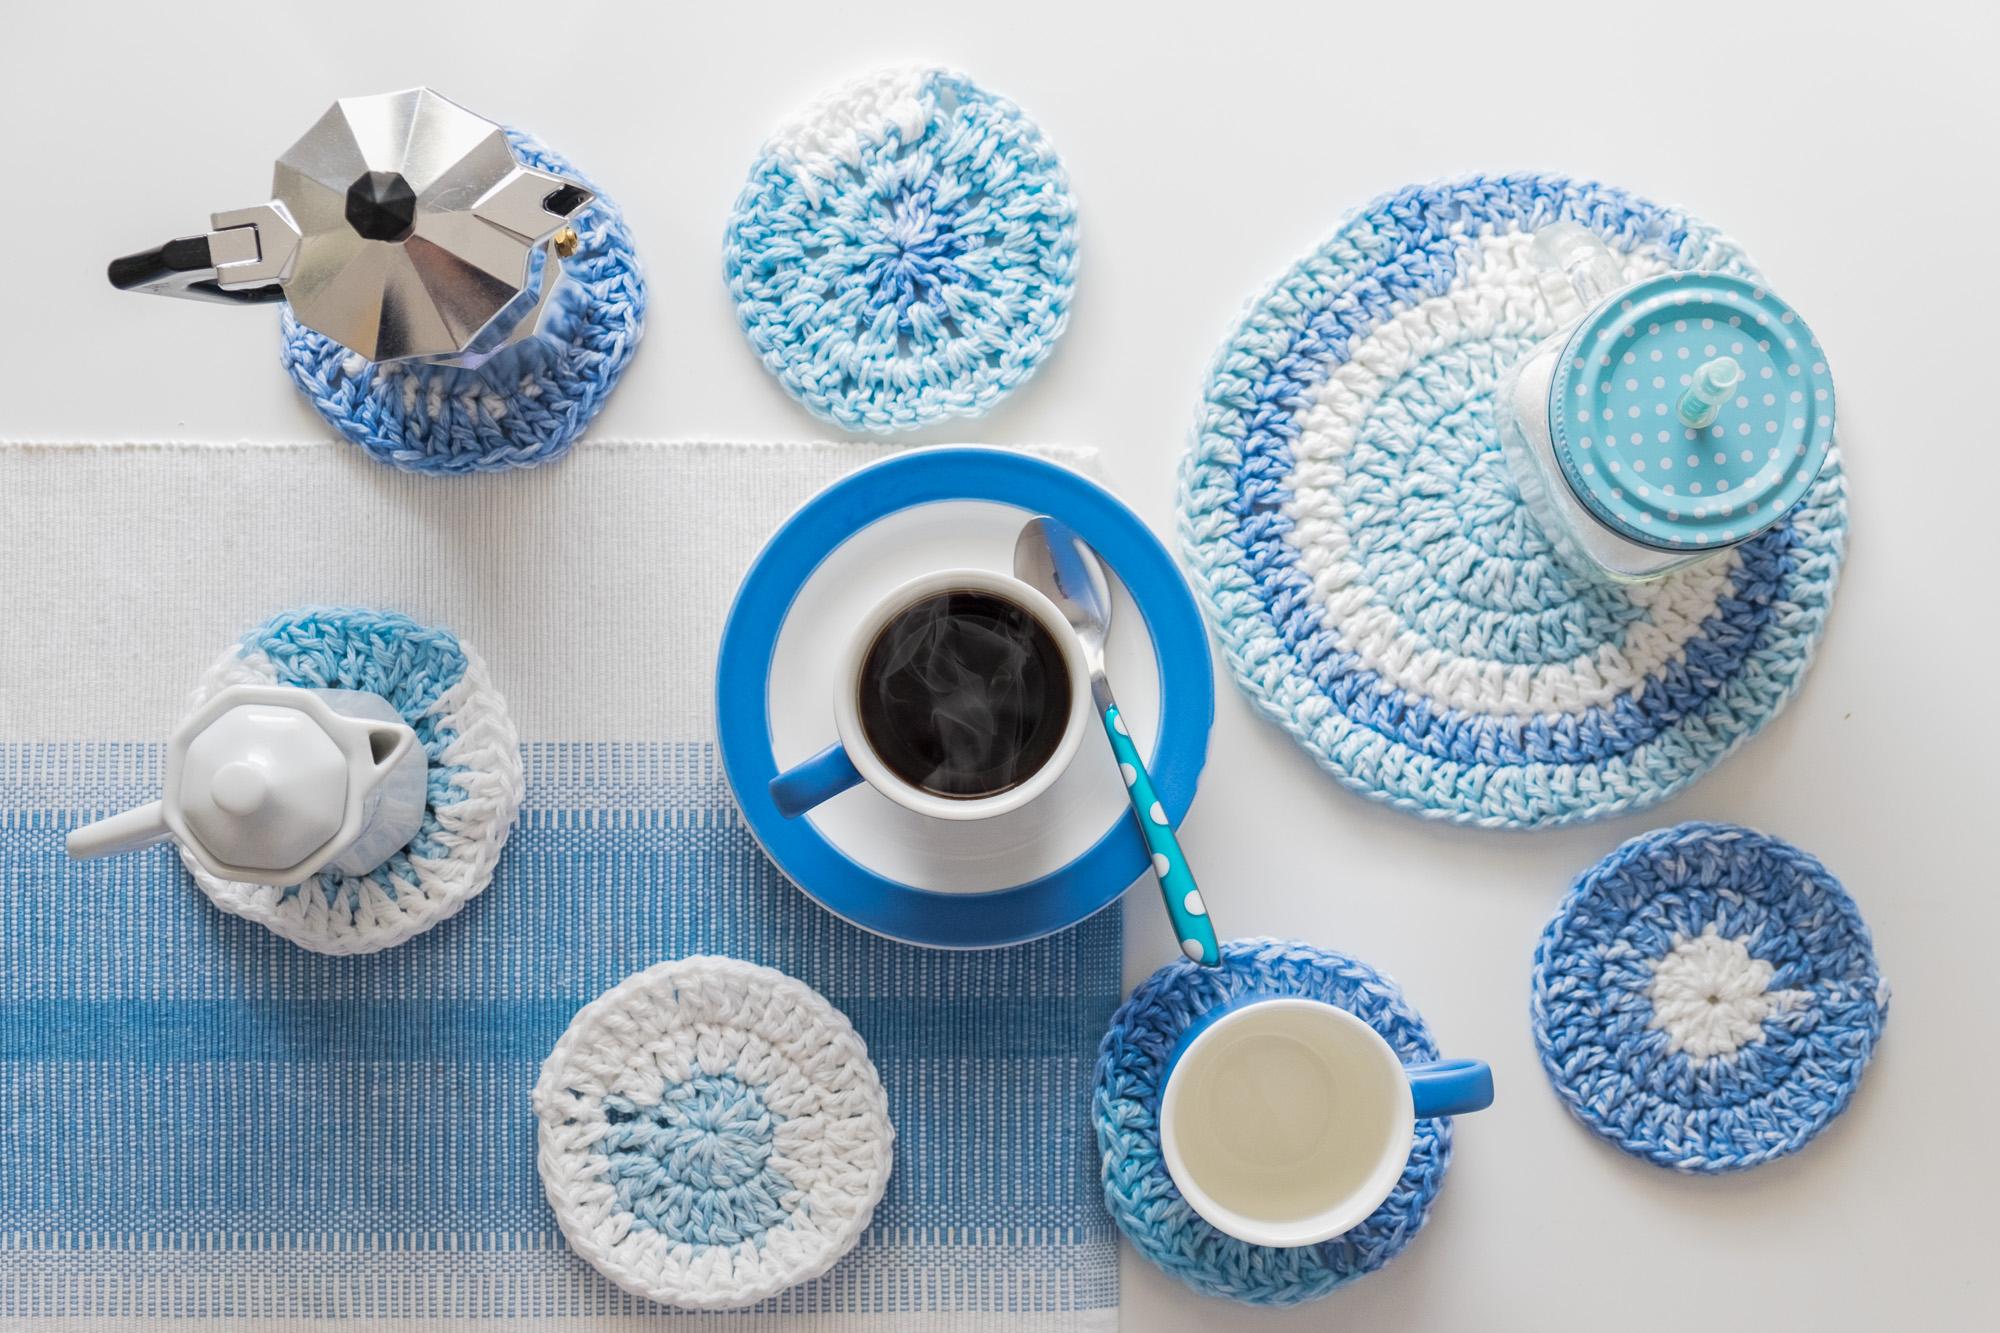 Posavasos de ganchillo azul circulares. Blue Crochet coasters.